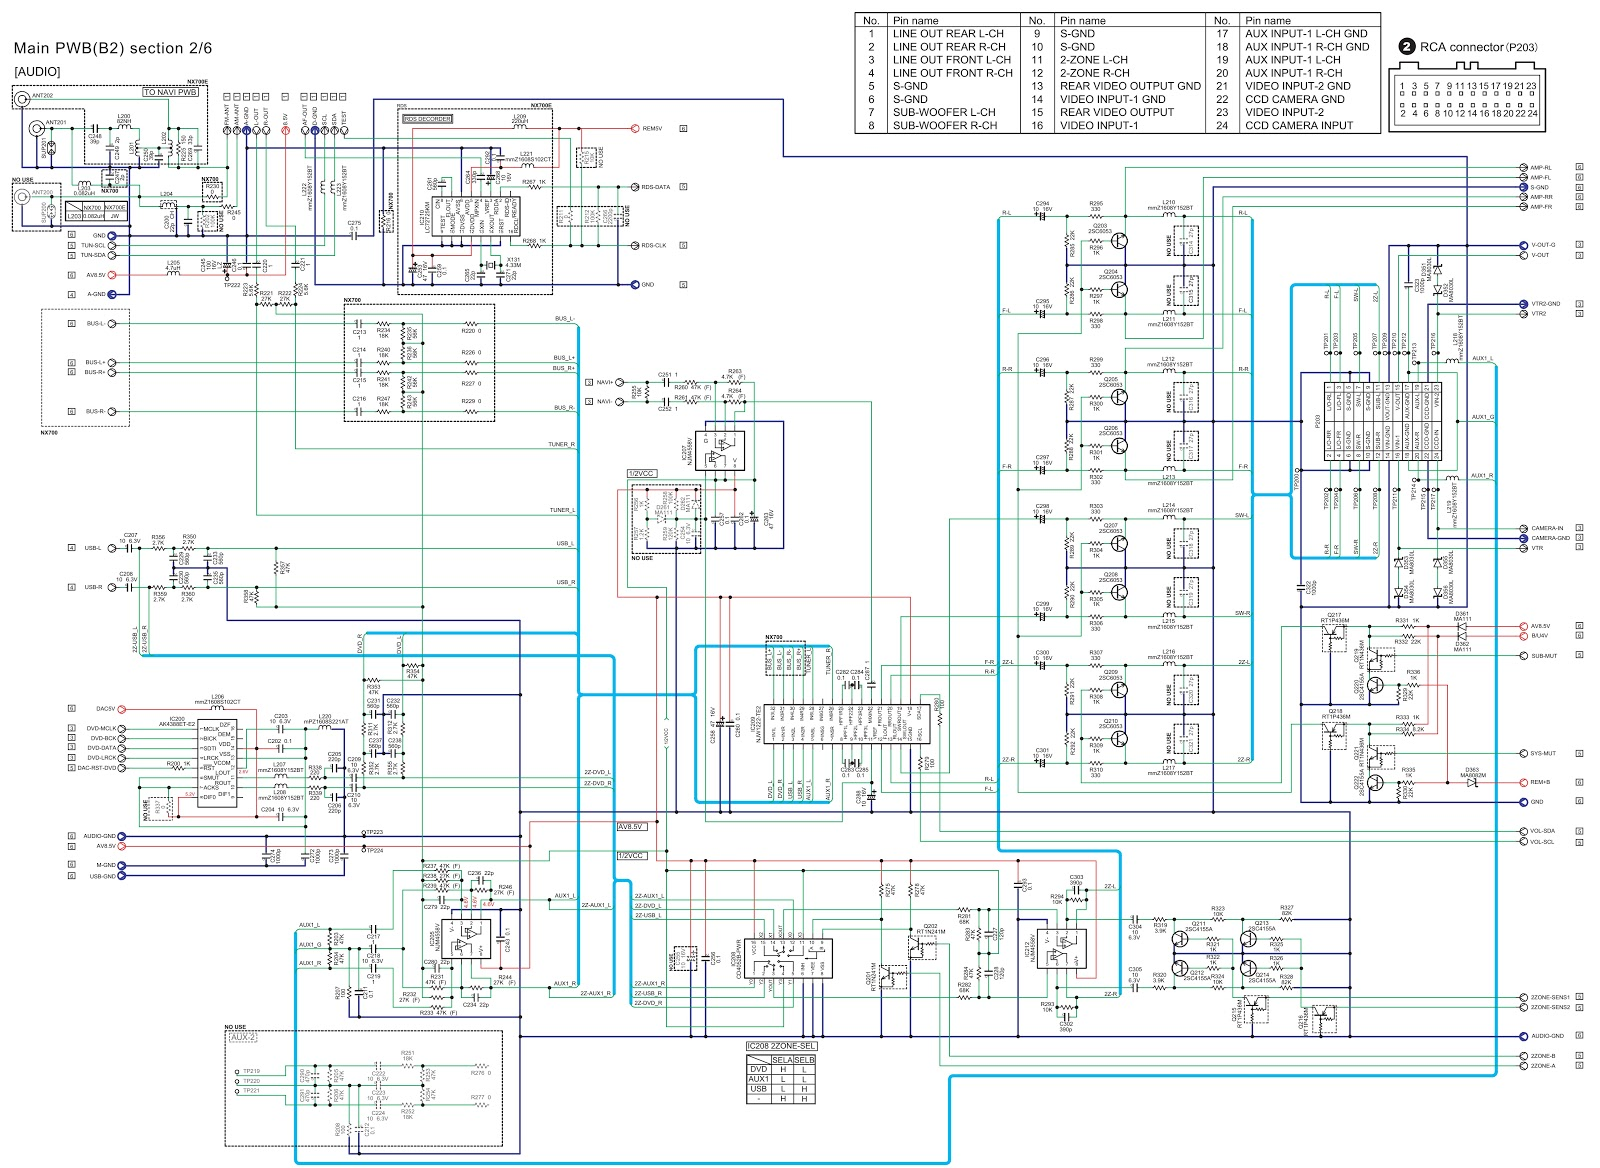 Clarion Nx700 Nx700e 2 Din Memory Navigation Dvd Wiring Diagram Main Pwb